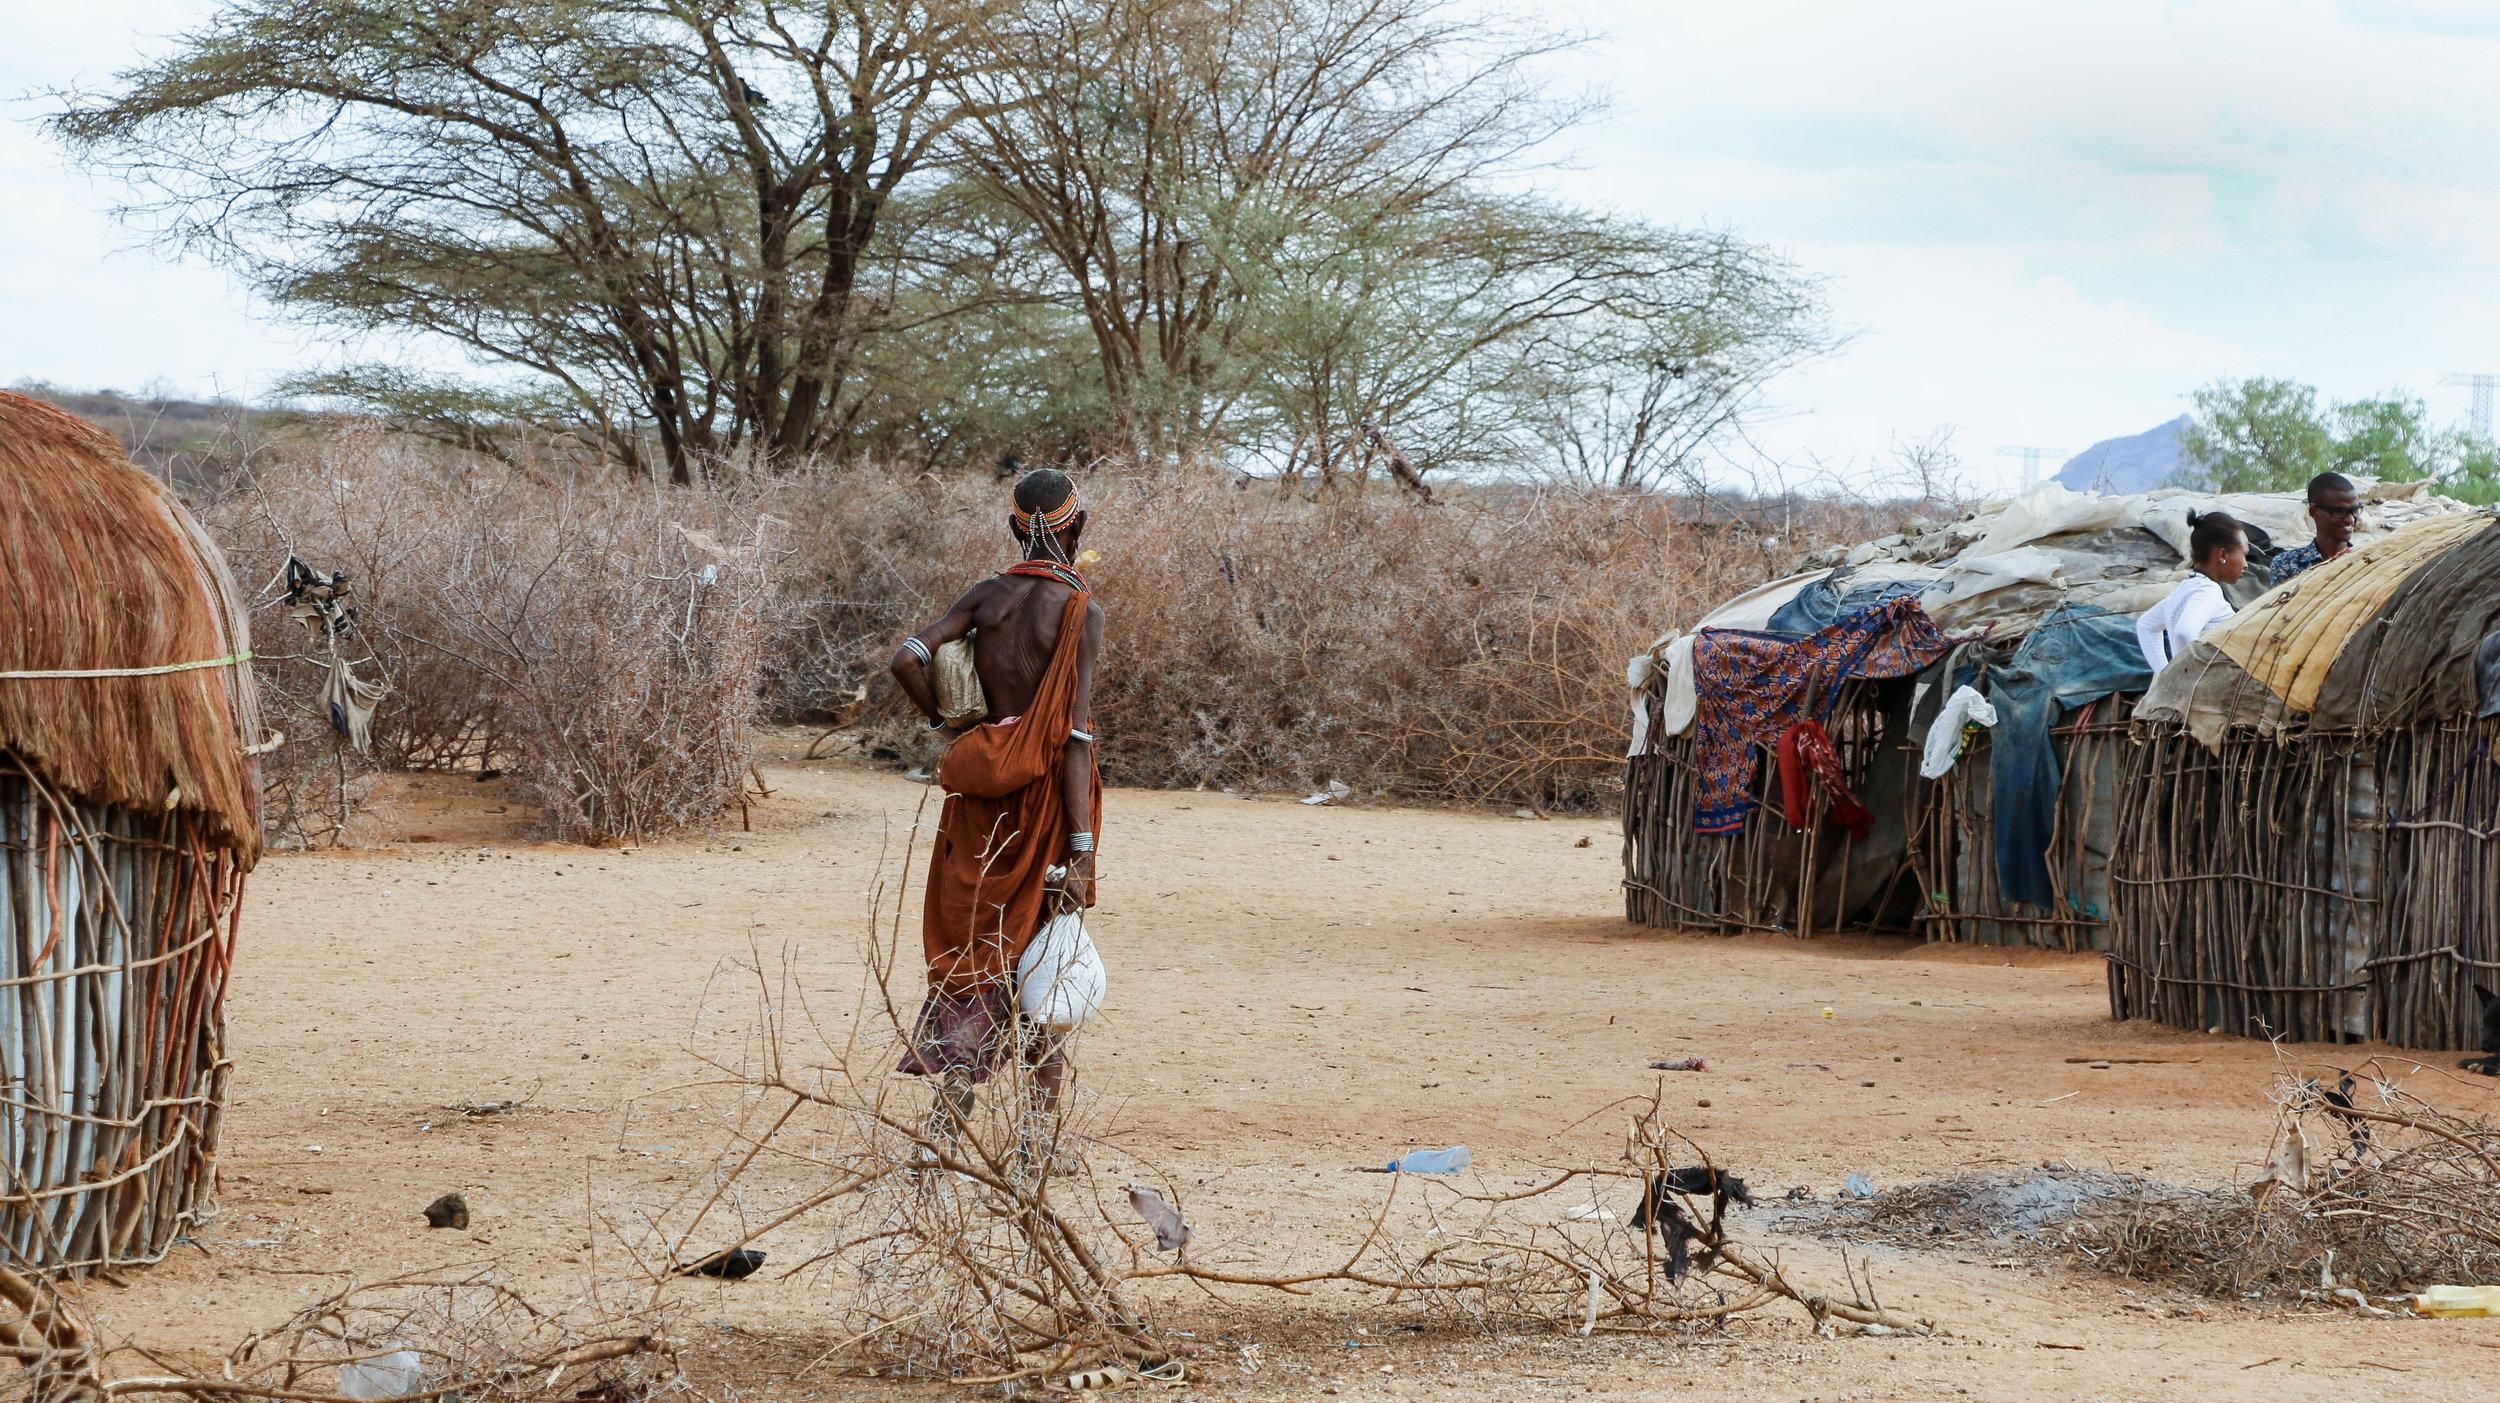 Africa2017-9.jpg